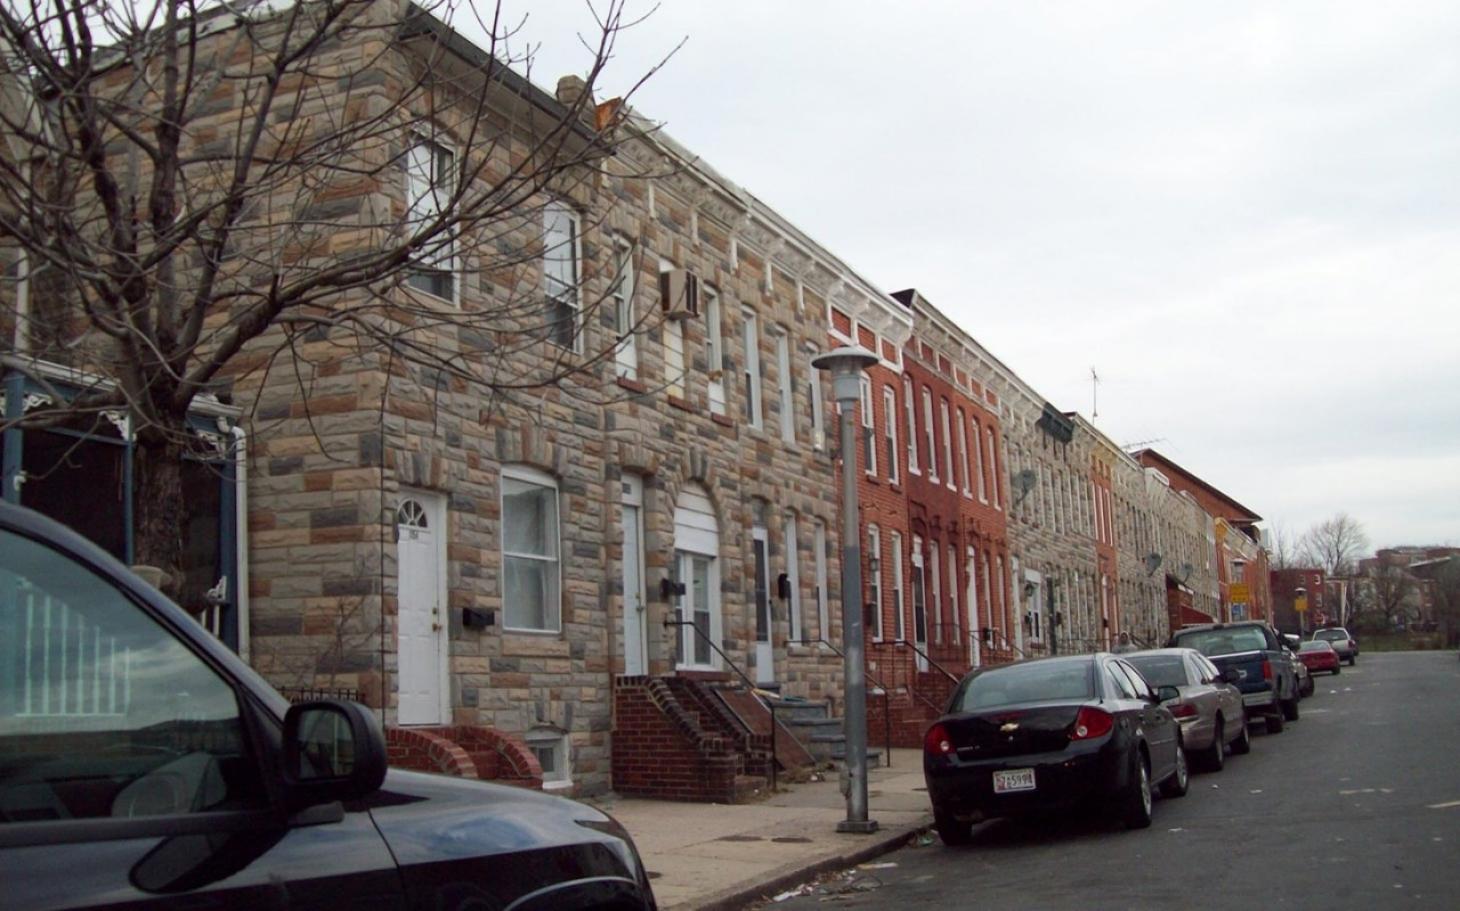 Baltimore S Poor White Residents Harassment Al Jazeera